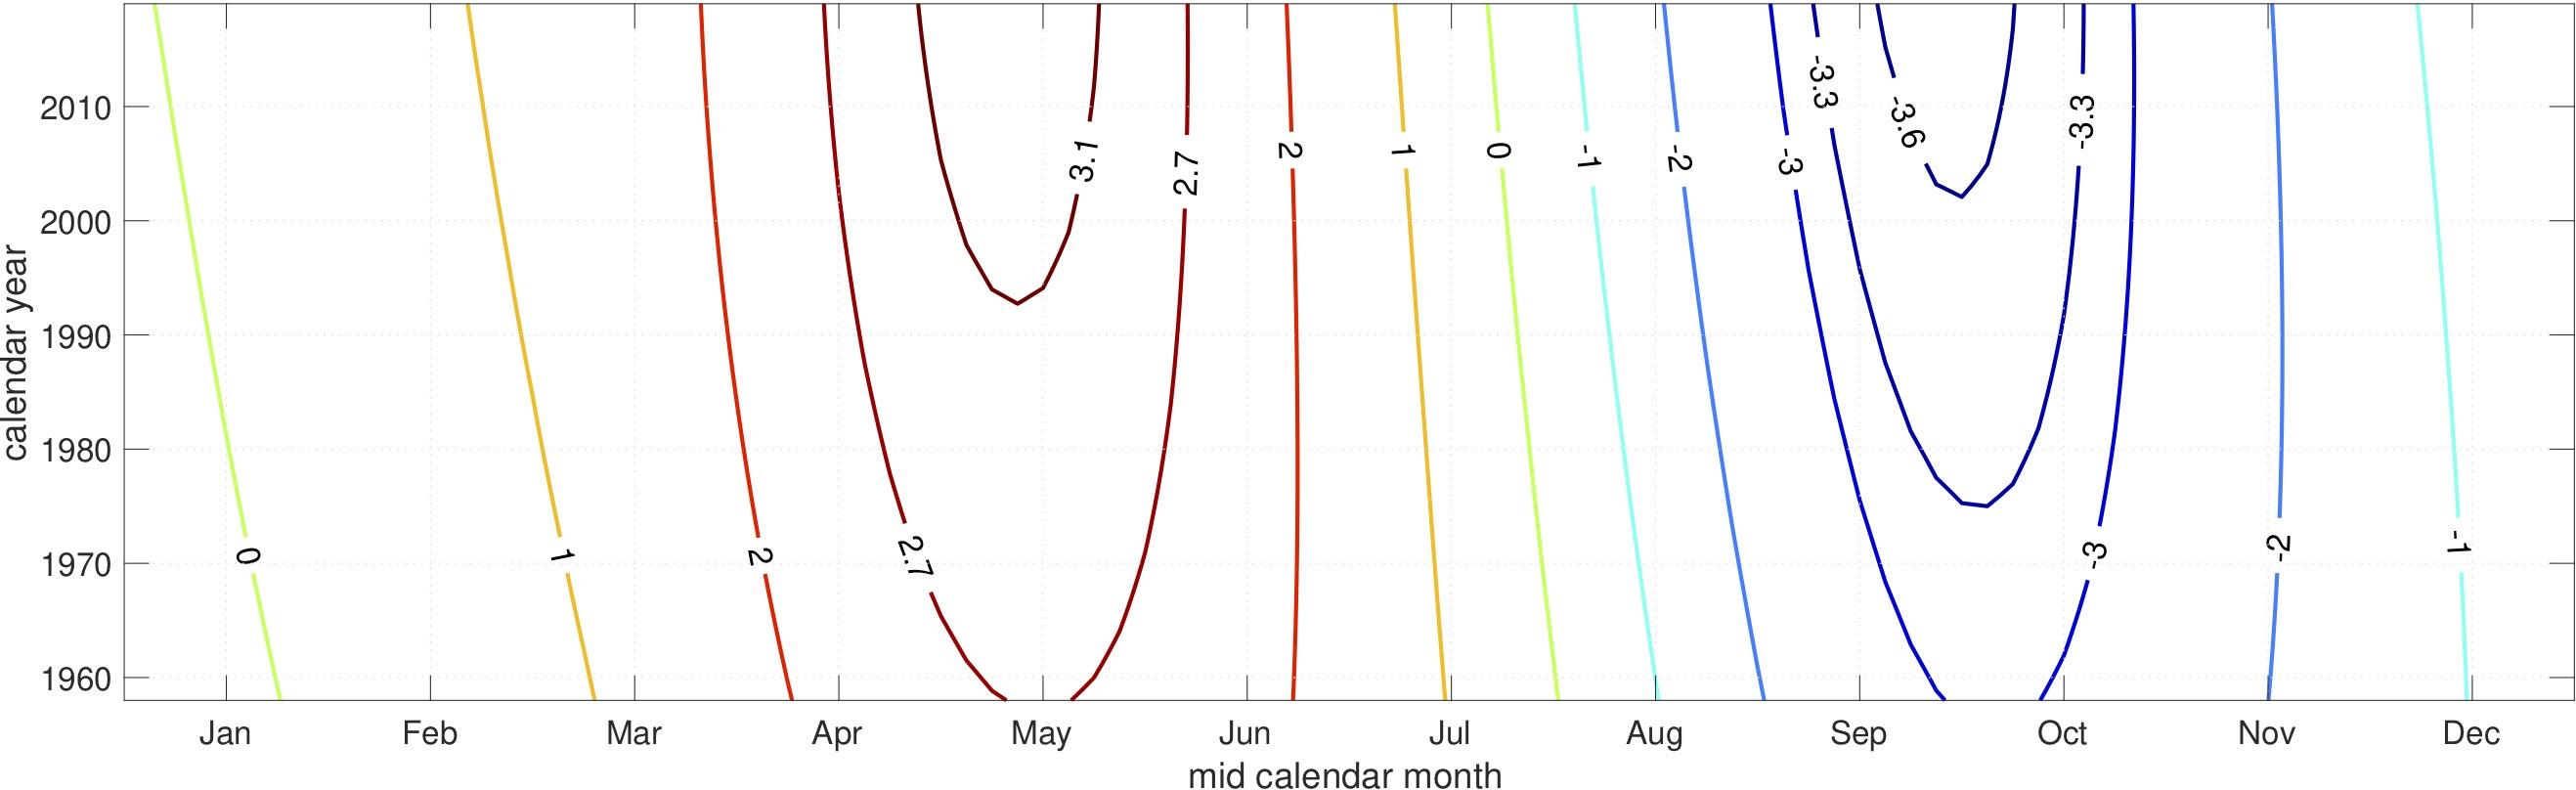 carbon dioxide seasonal variation